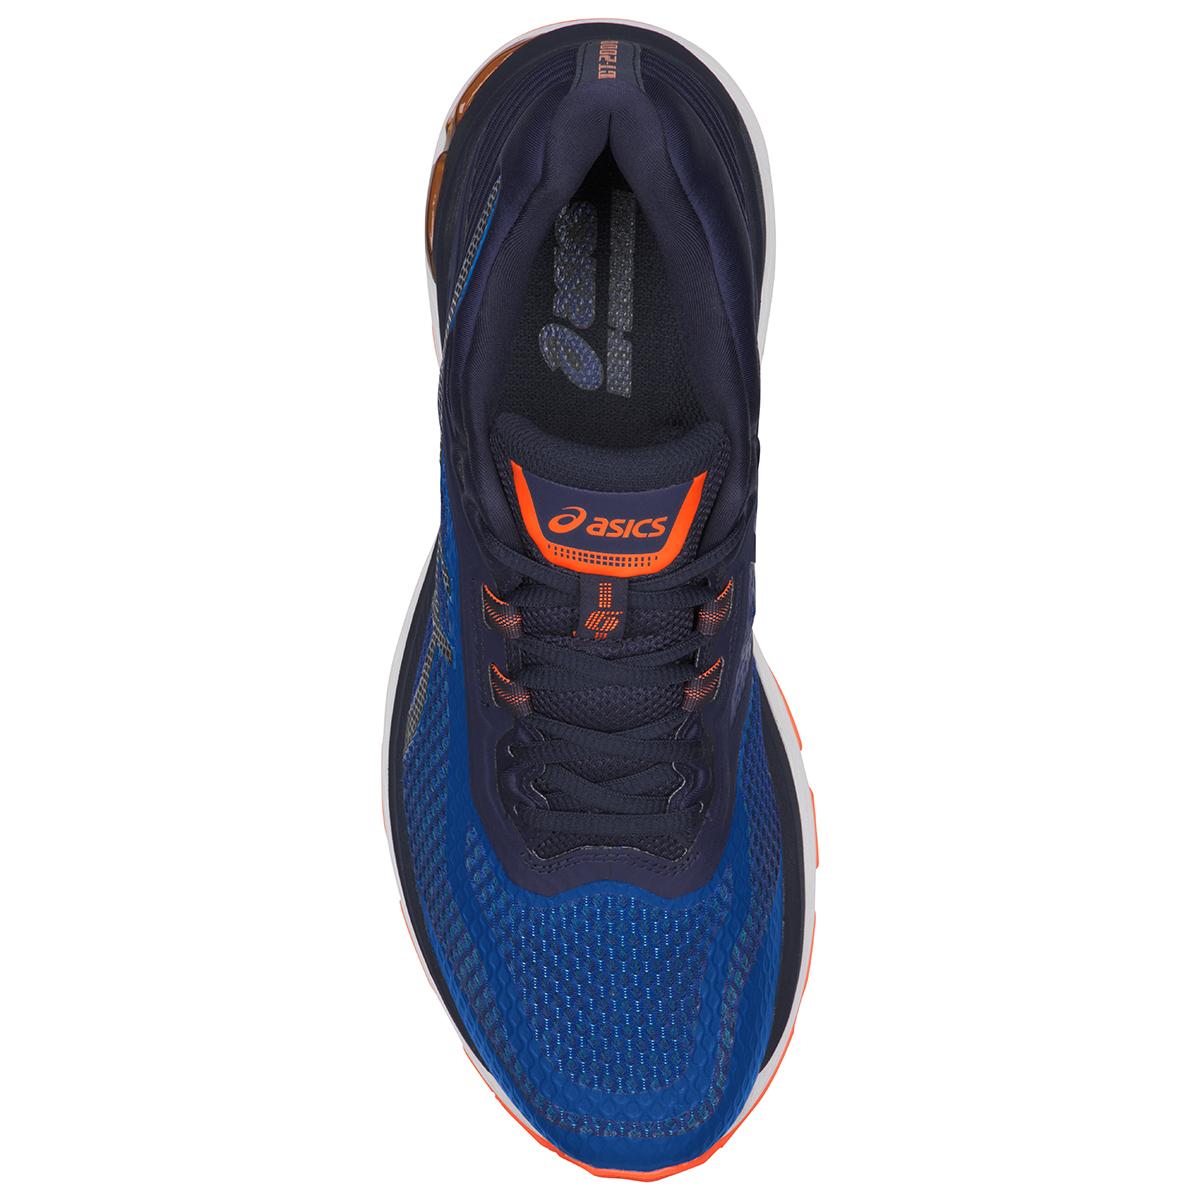 Men's Asics GT-2000 6 Running Shoe - Color: Imperial/Indigo (Regular Width) - Size: 10, Imperial/Indigo, large, image 3